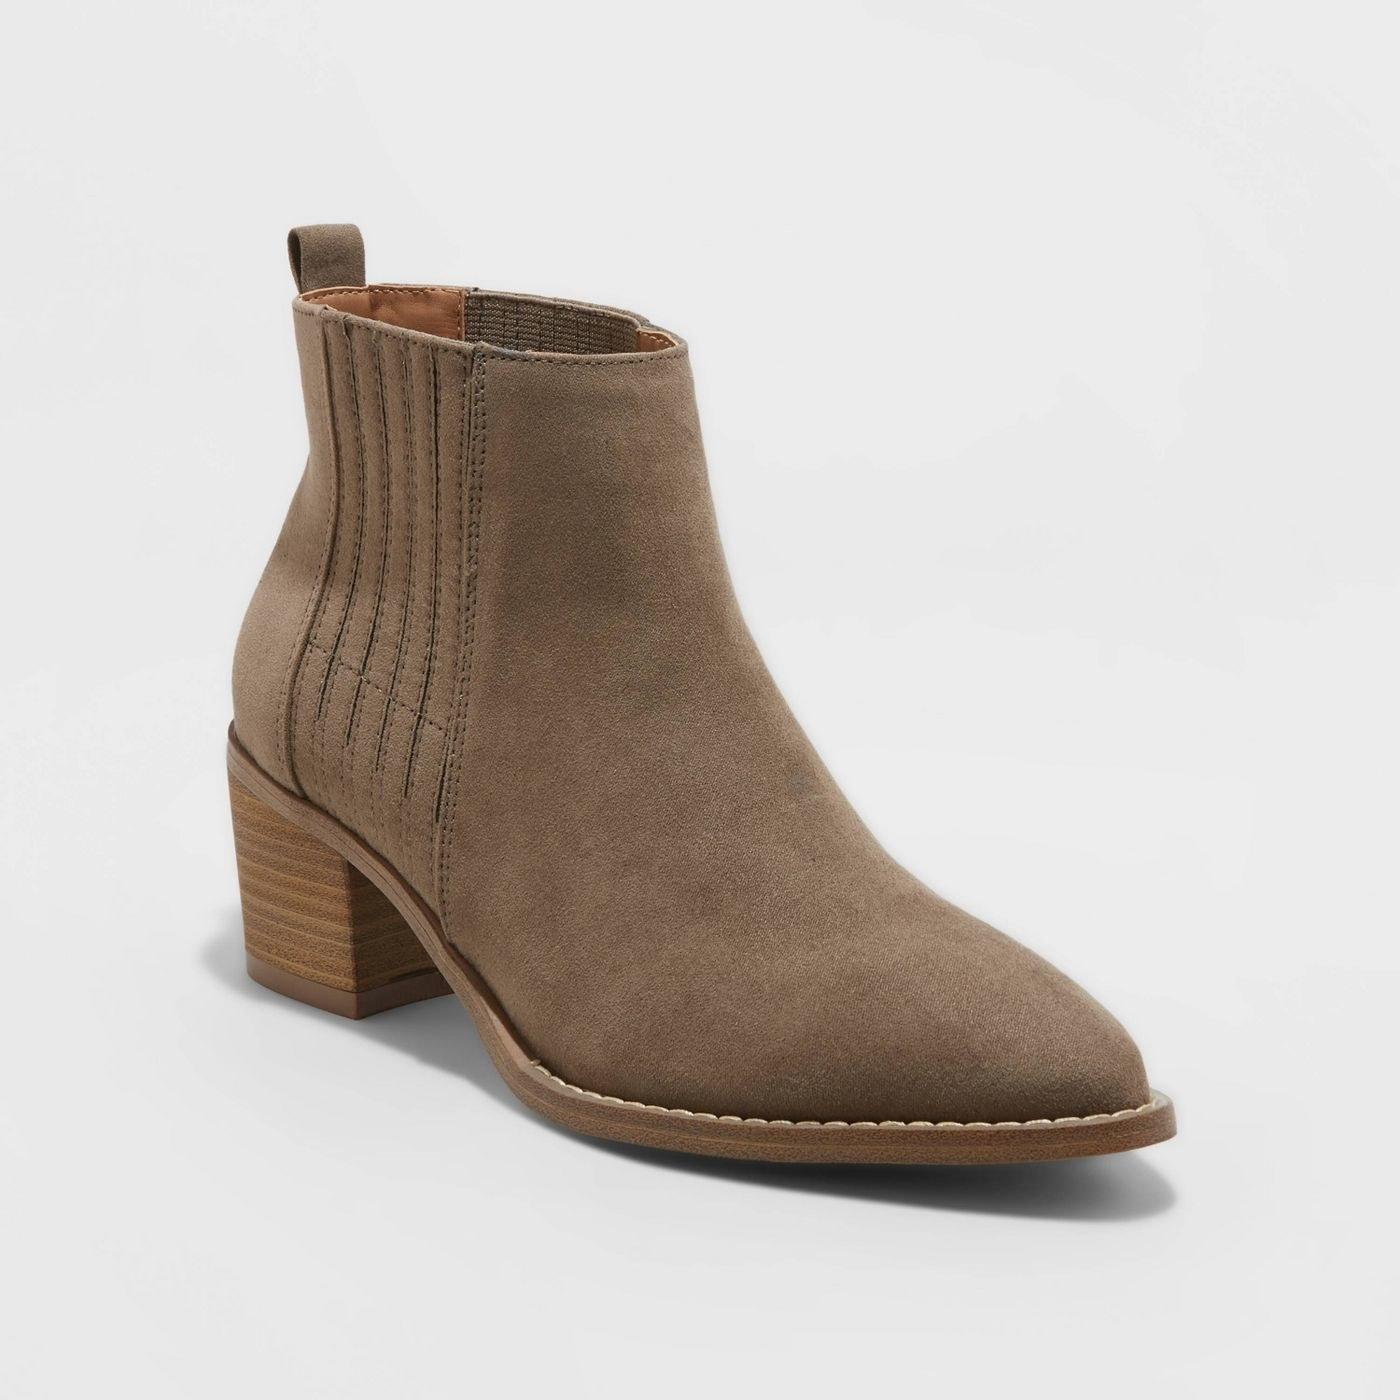 Tan pointed toe block heeled booties